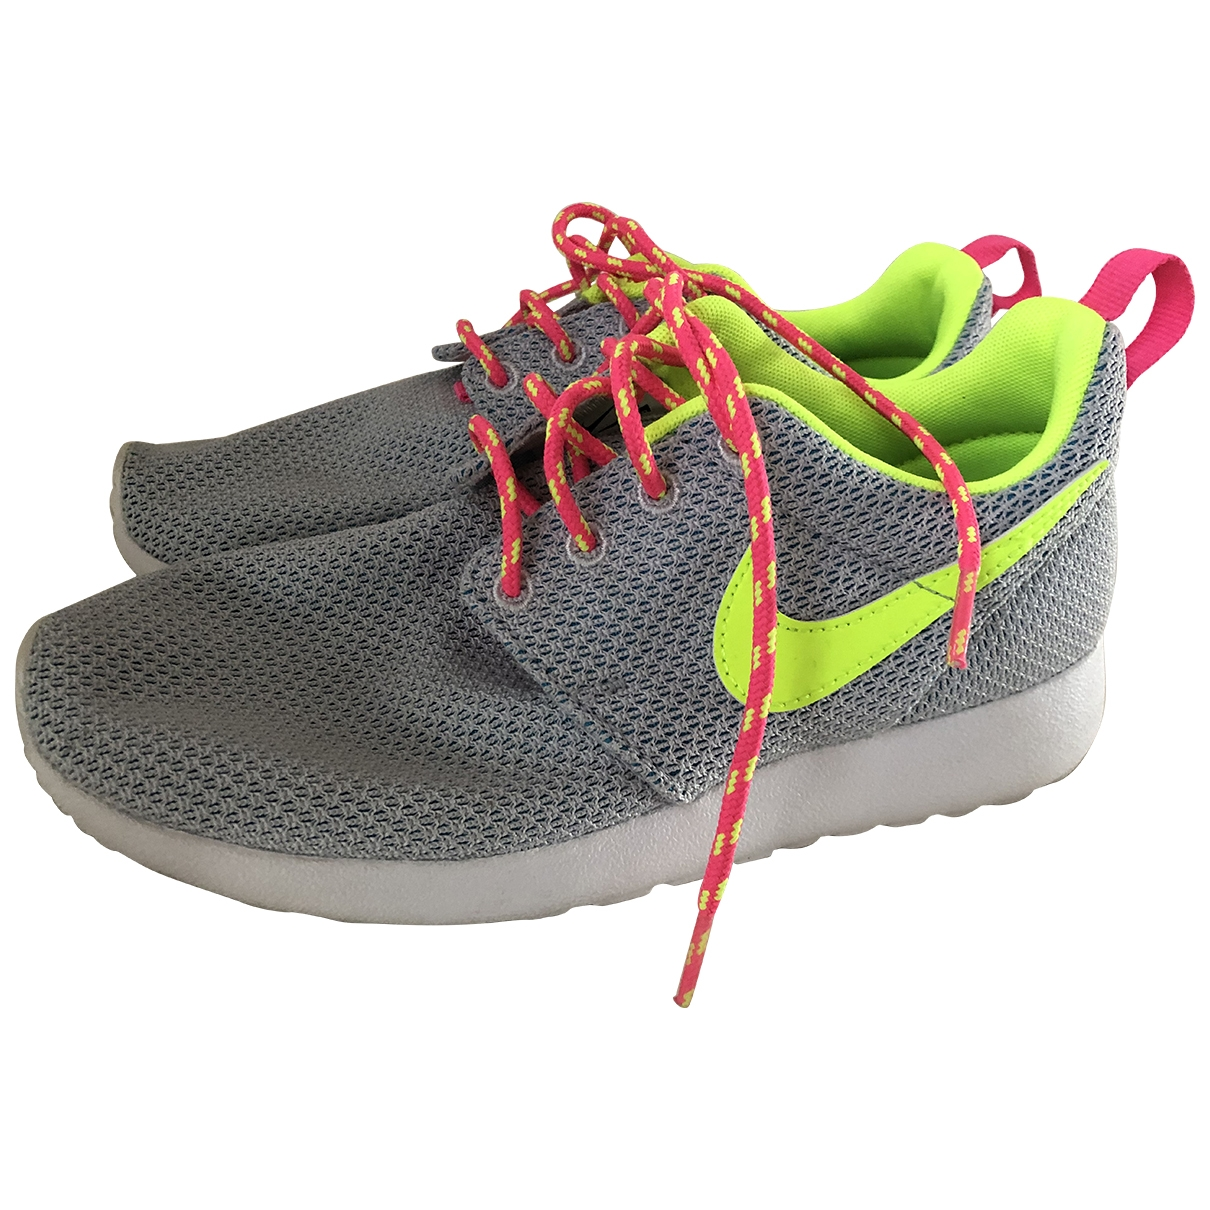 Nike - Baskets Roshe Run pour femme en toile - gris